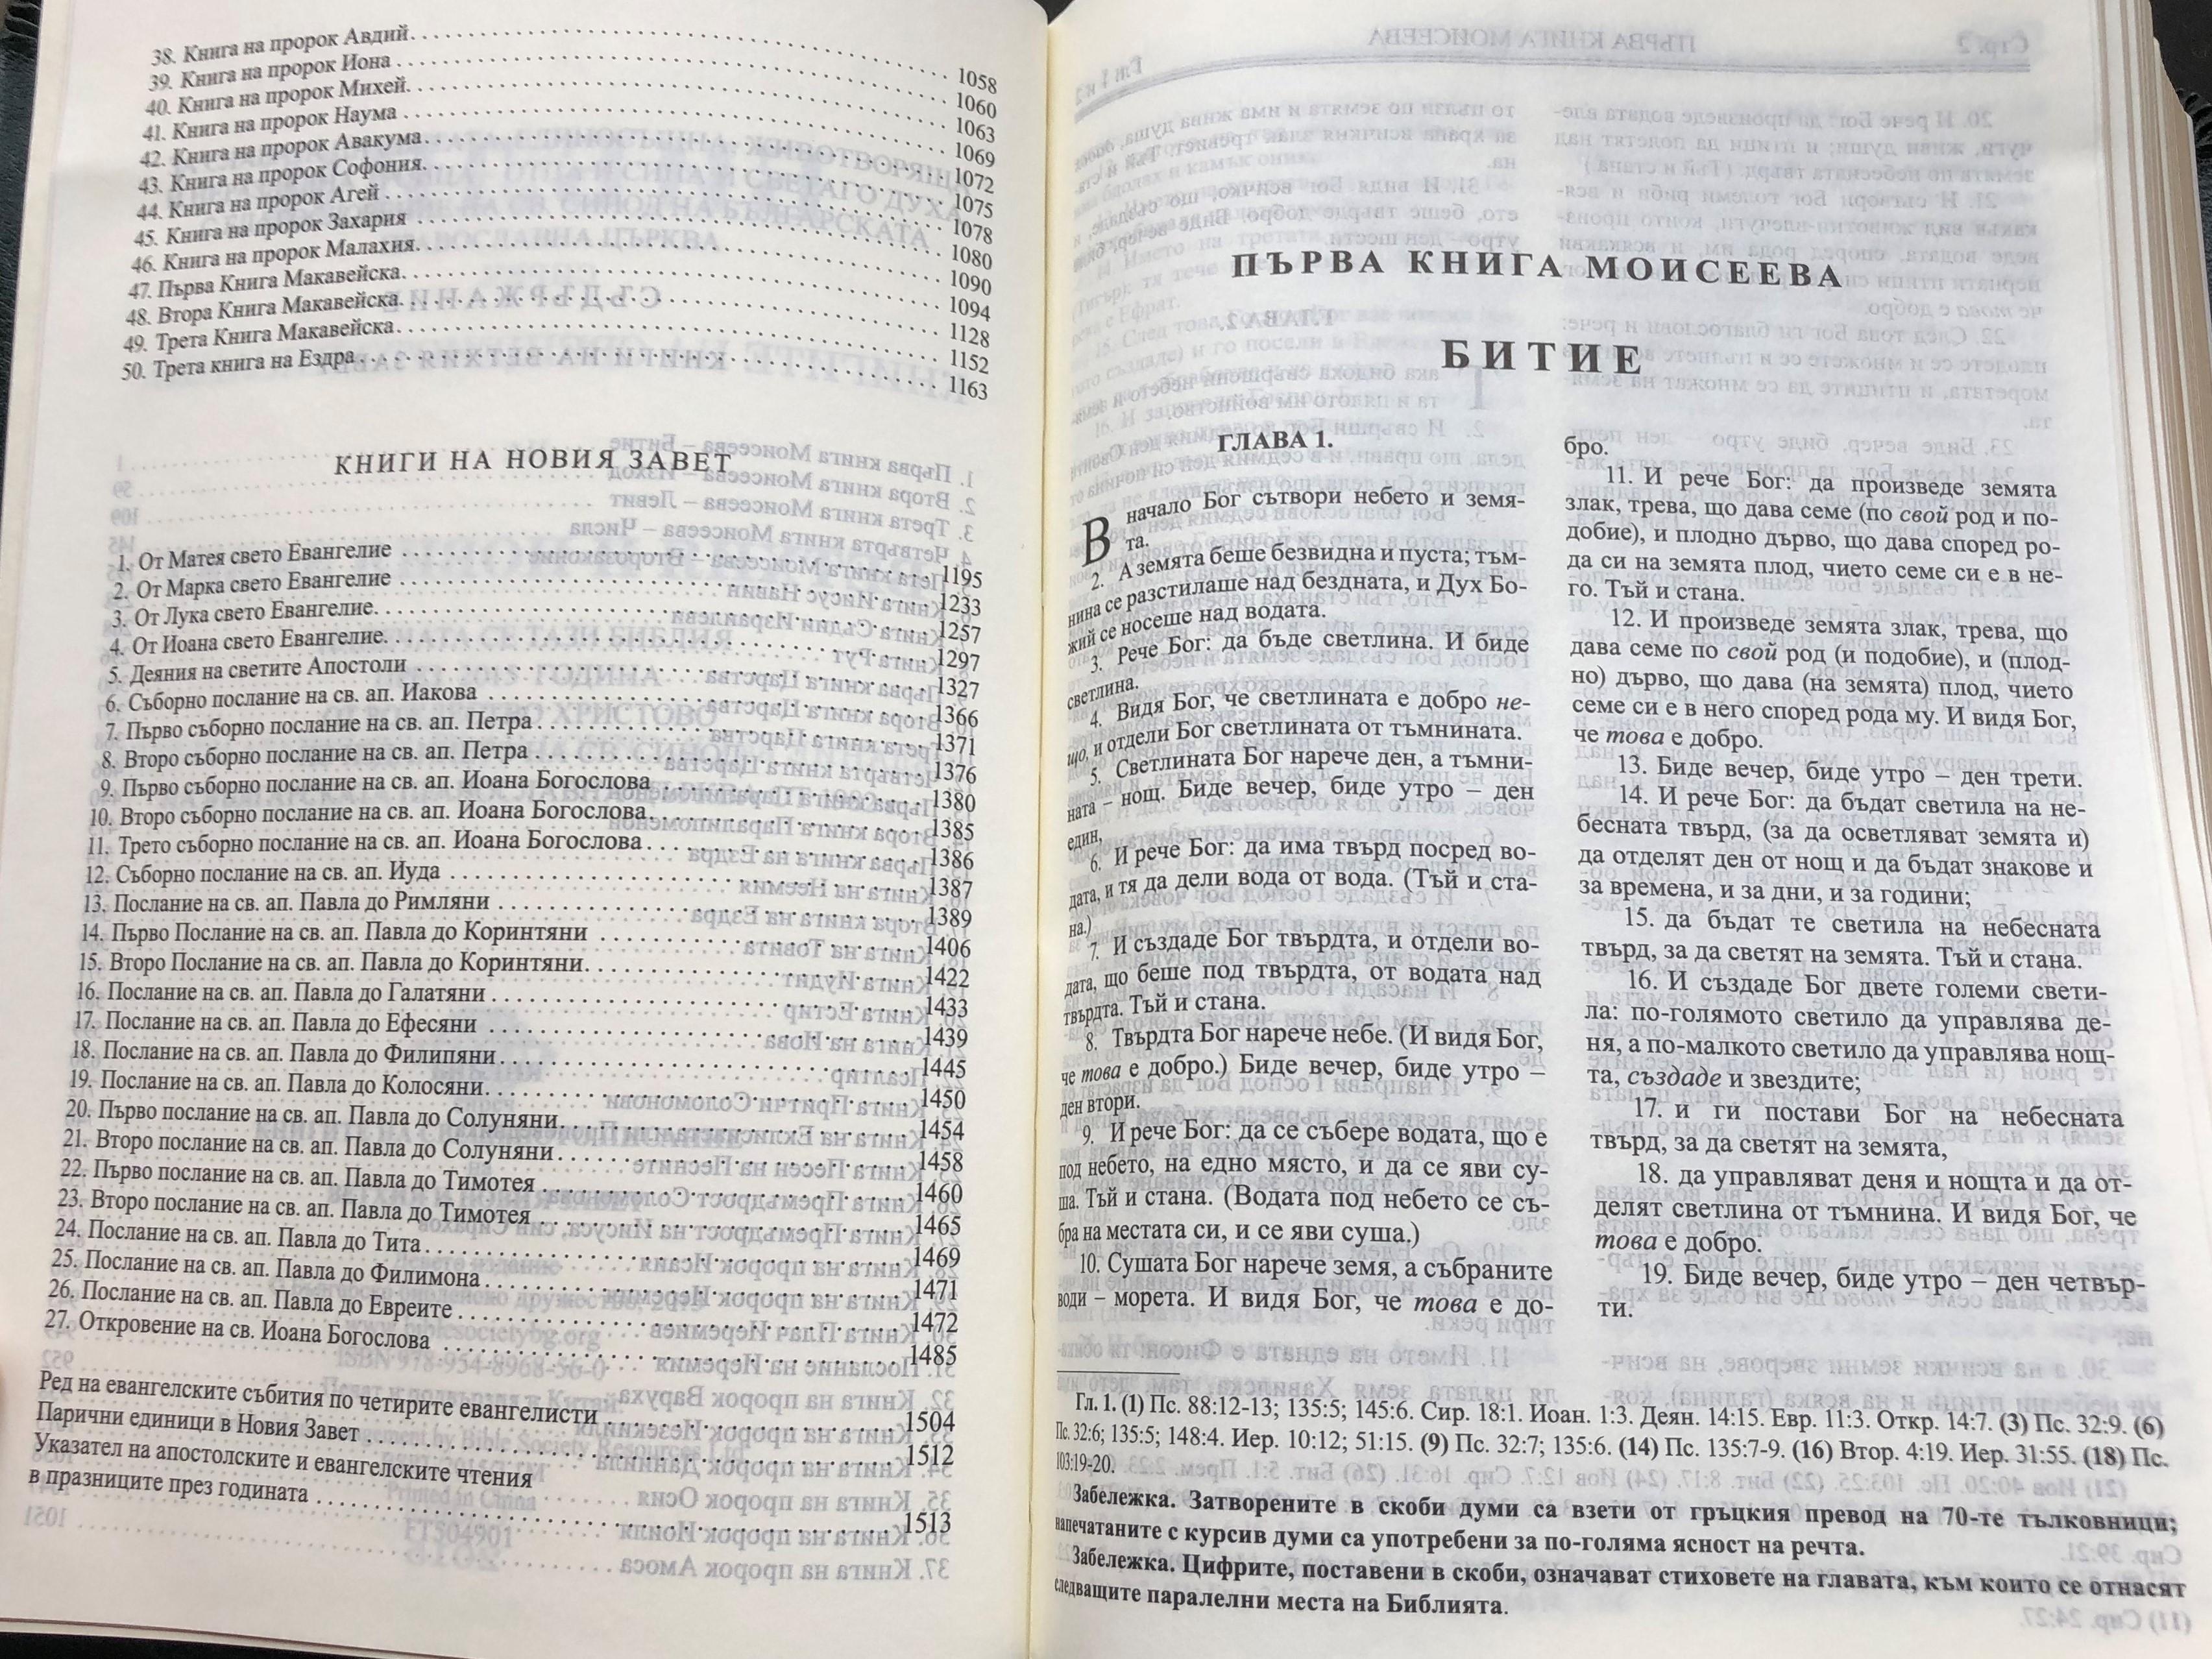 bulgarian-black-leather-bound-bible-golden-cross-cover-7-.jpg